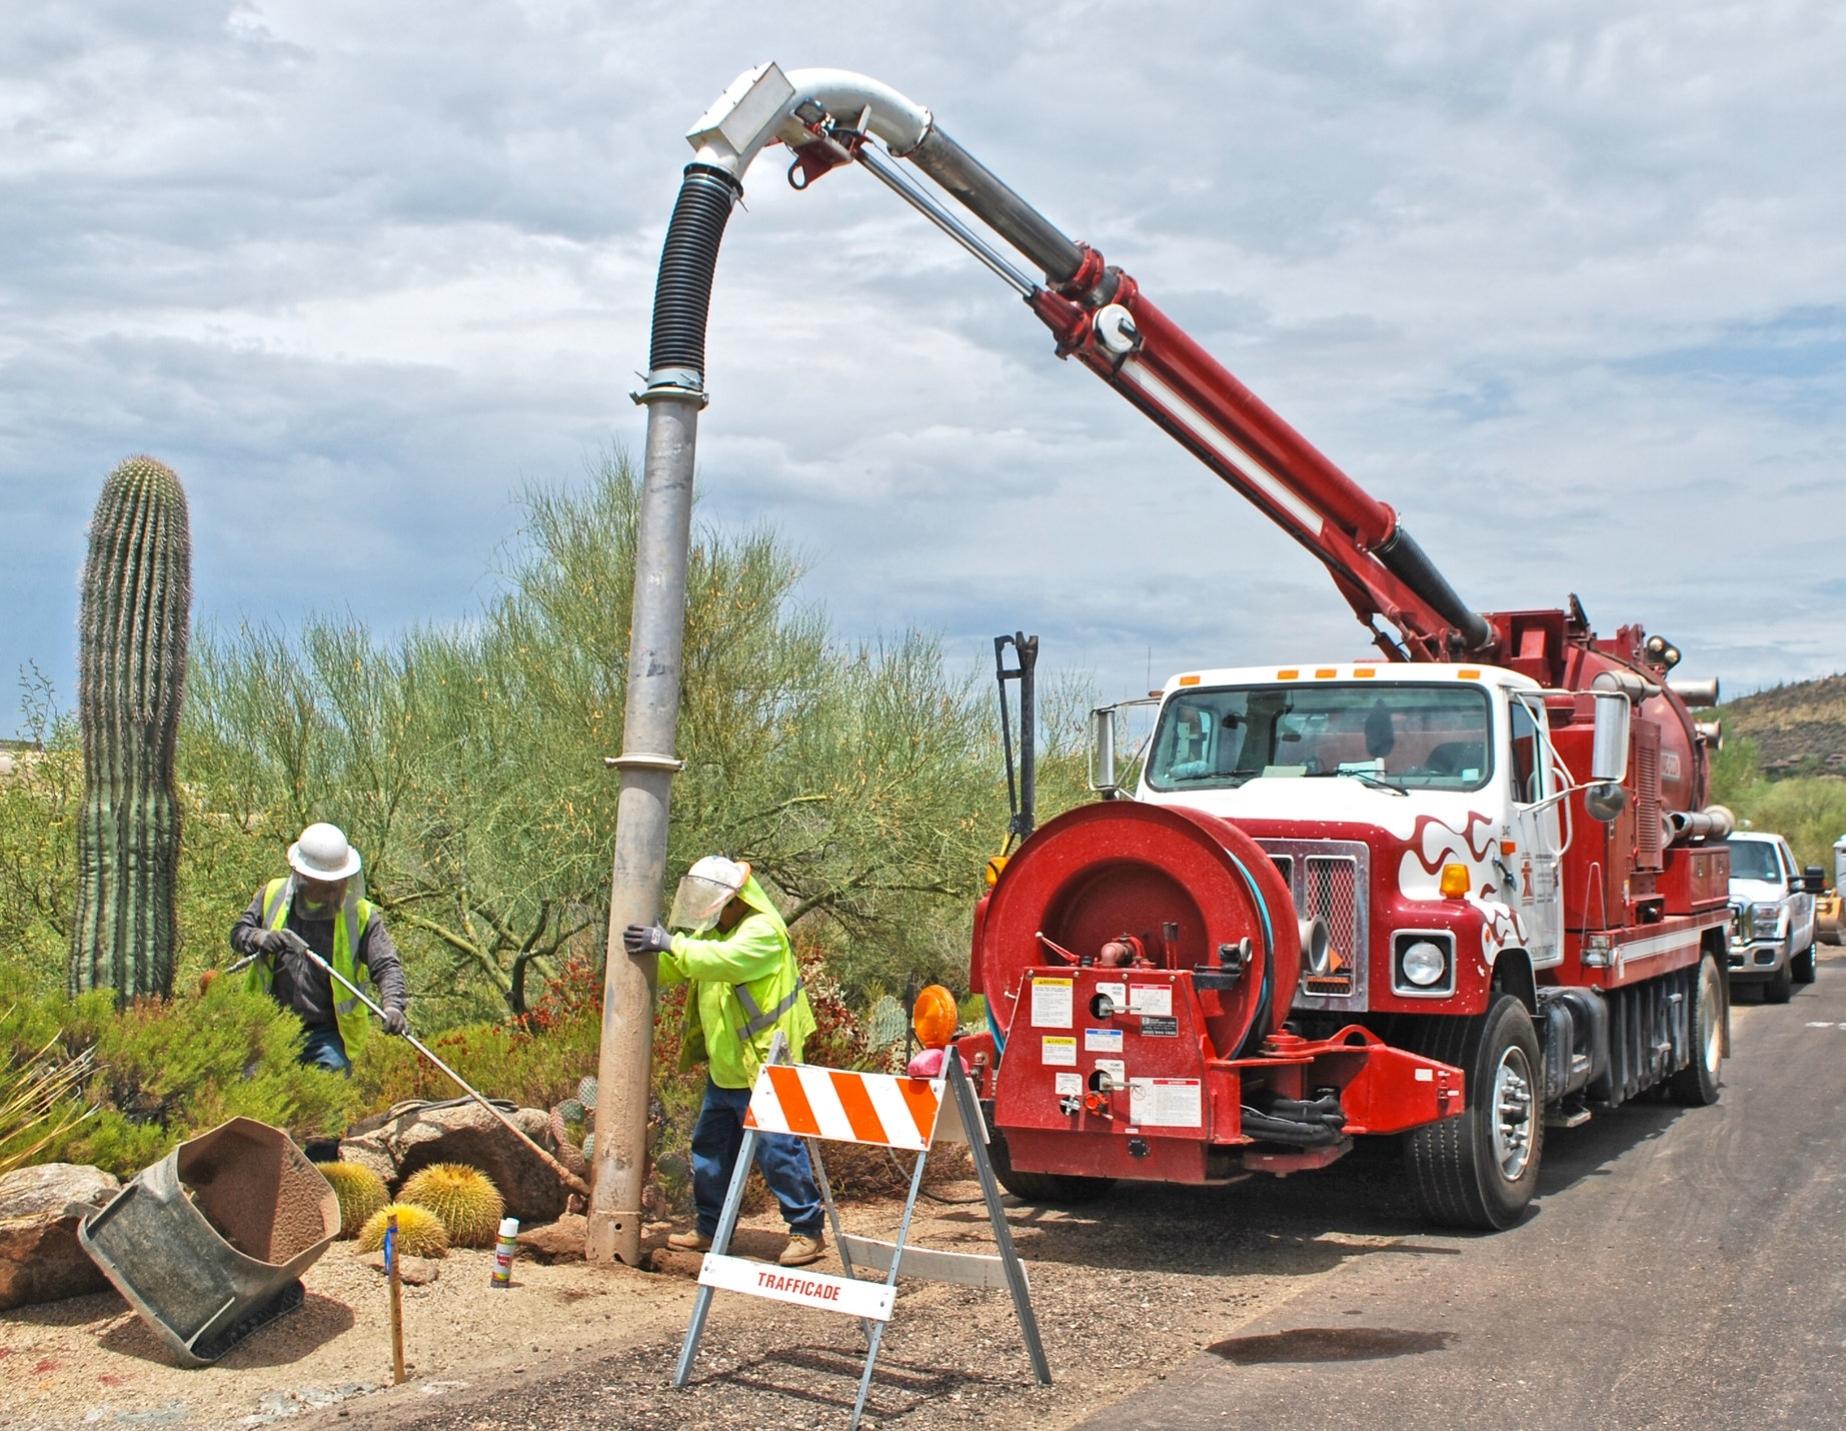 Citywide Water Resources Infrastructure JOC